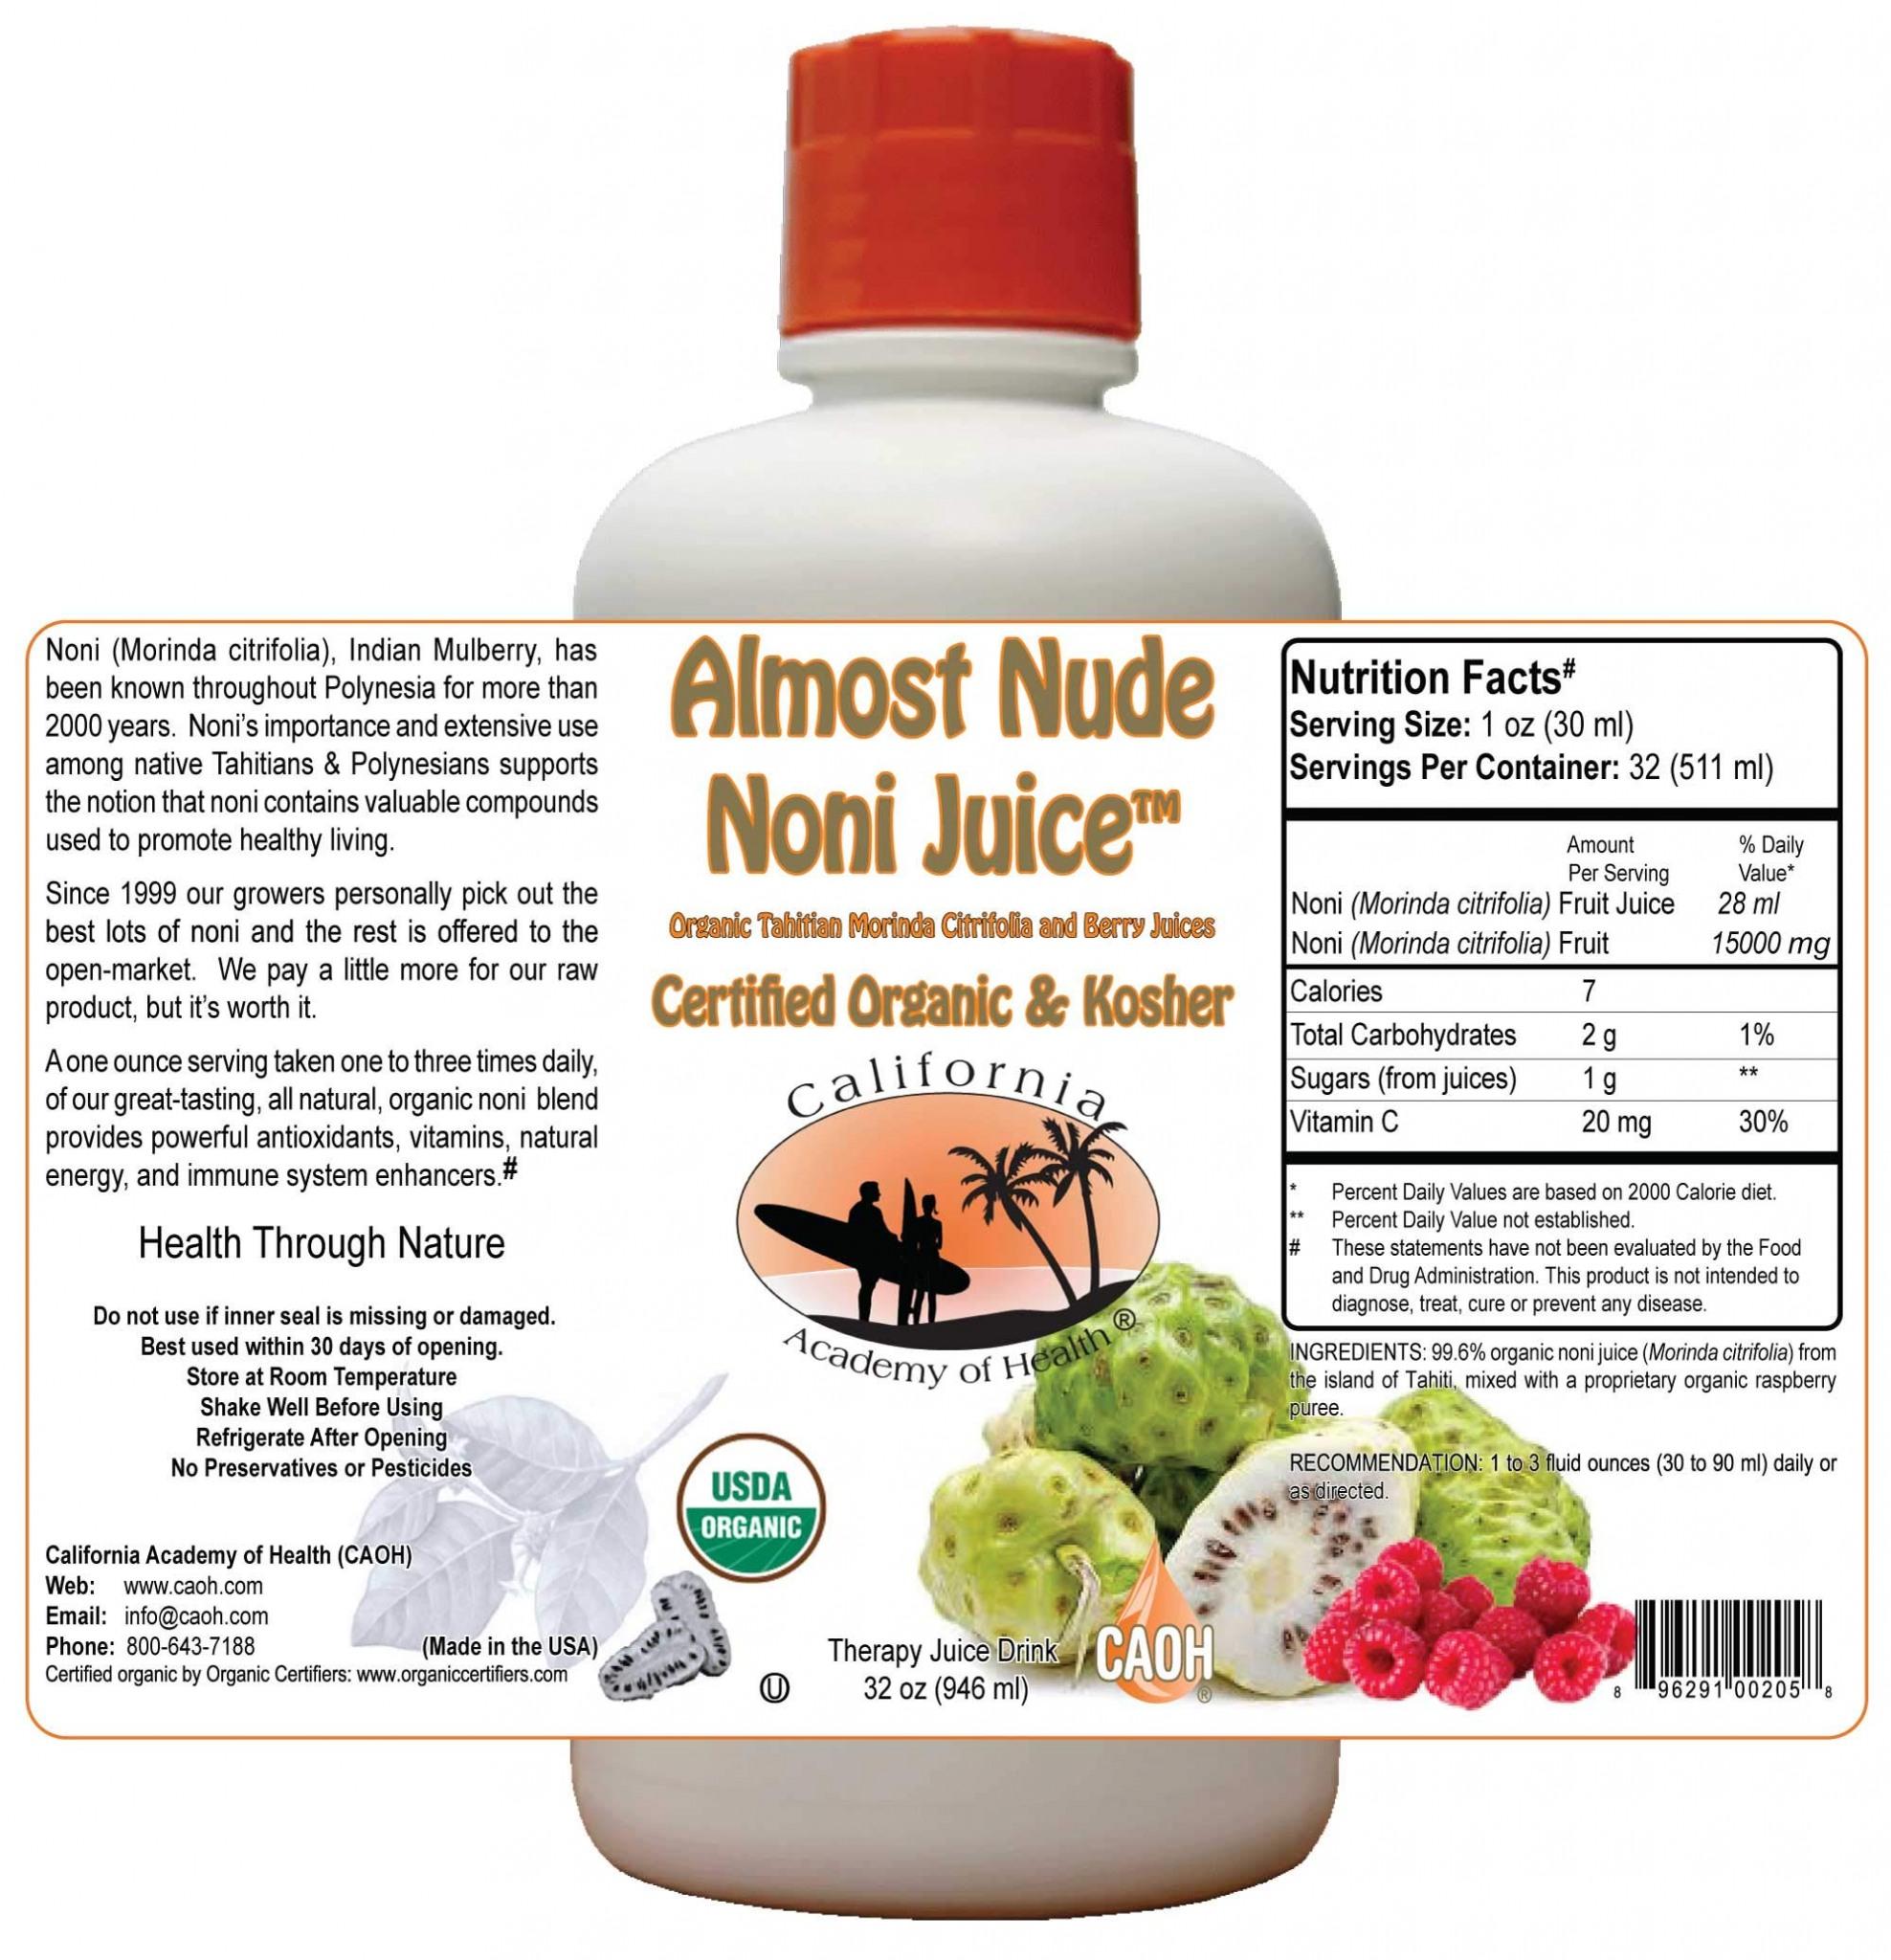 Totally Nude Noni Juice